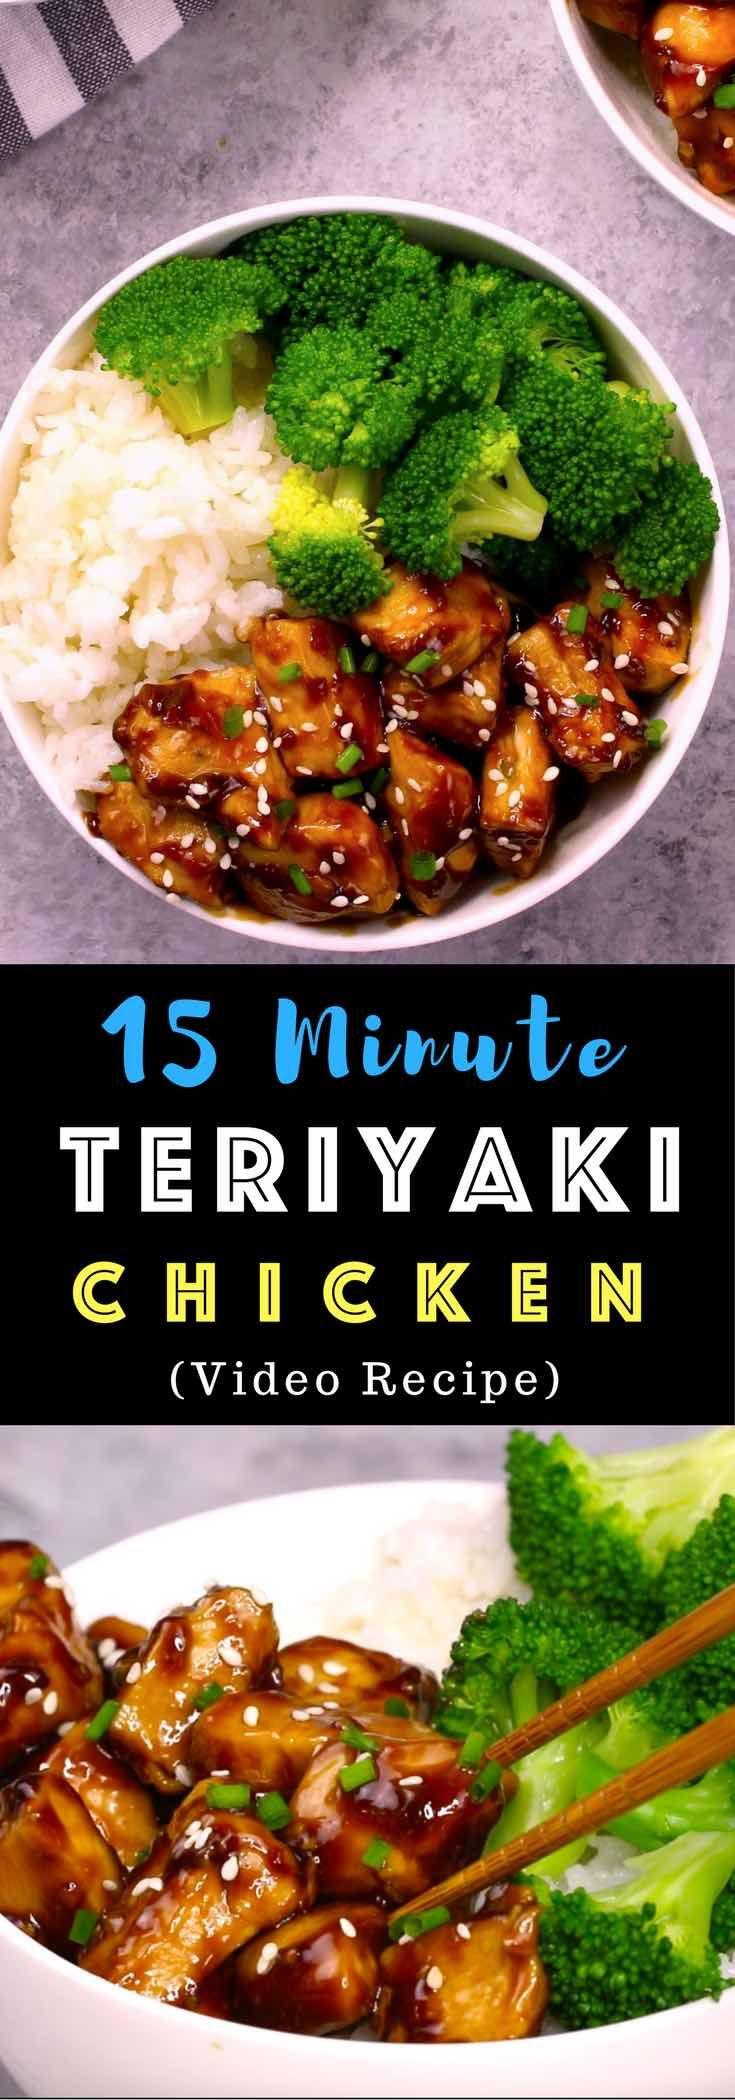 Easy Teriyaki Chicken (with Video) - TipBuzz